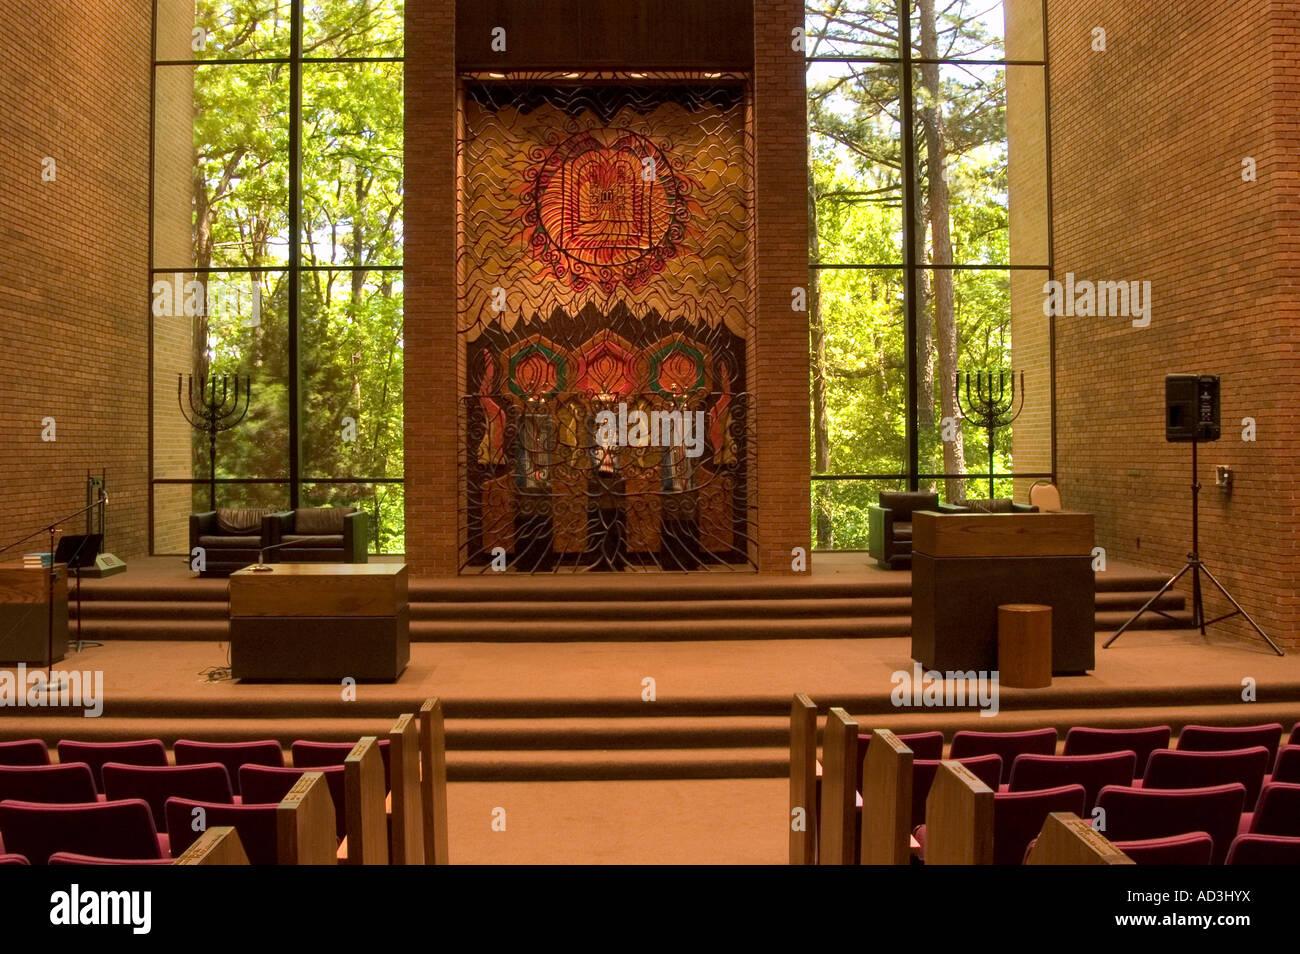 Temple Bnai Israel in Little Rock Arkansas - Stock Image